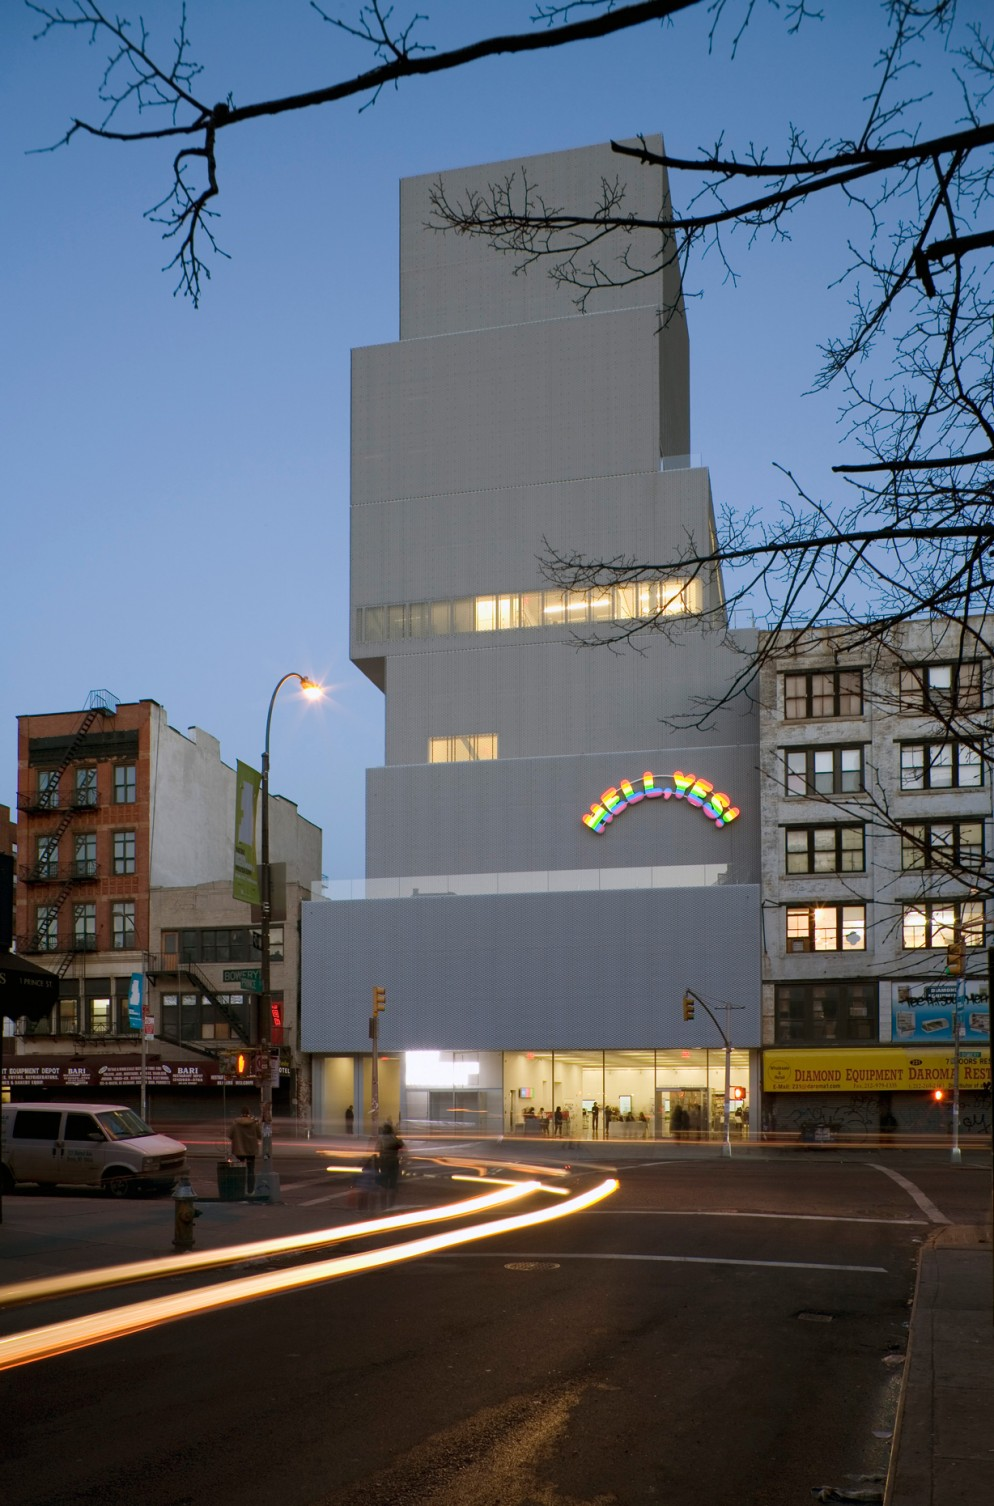 architetti-famosi-sanaa-GettyImages-157881184-living-corriere